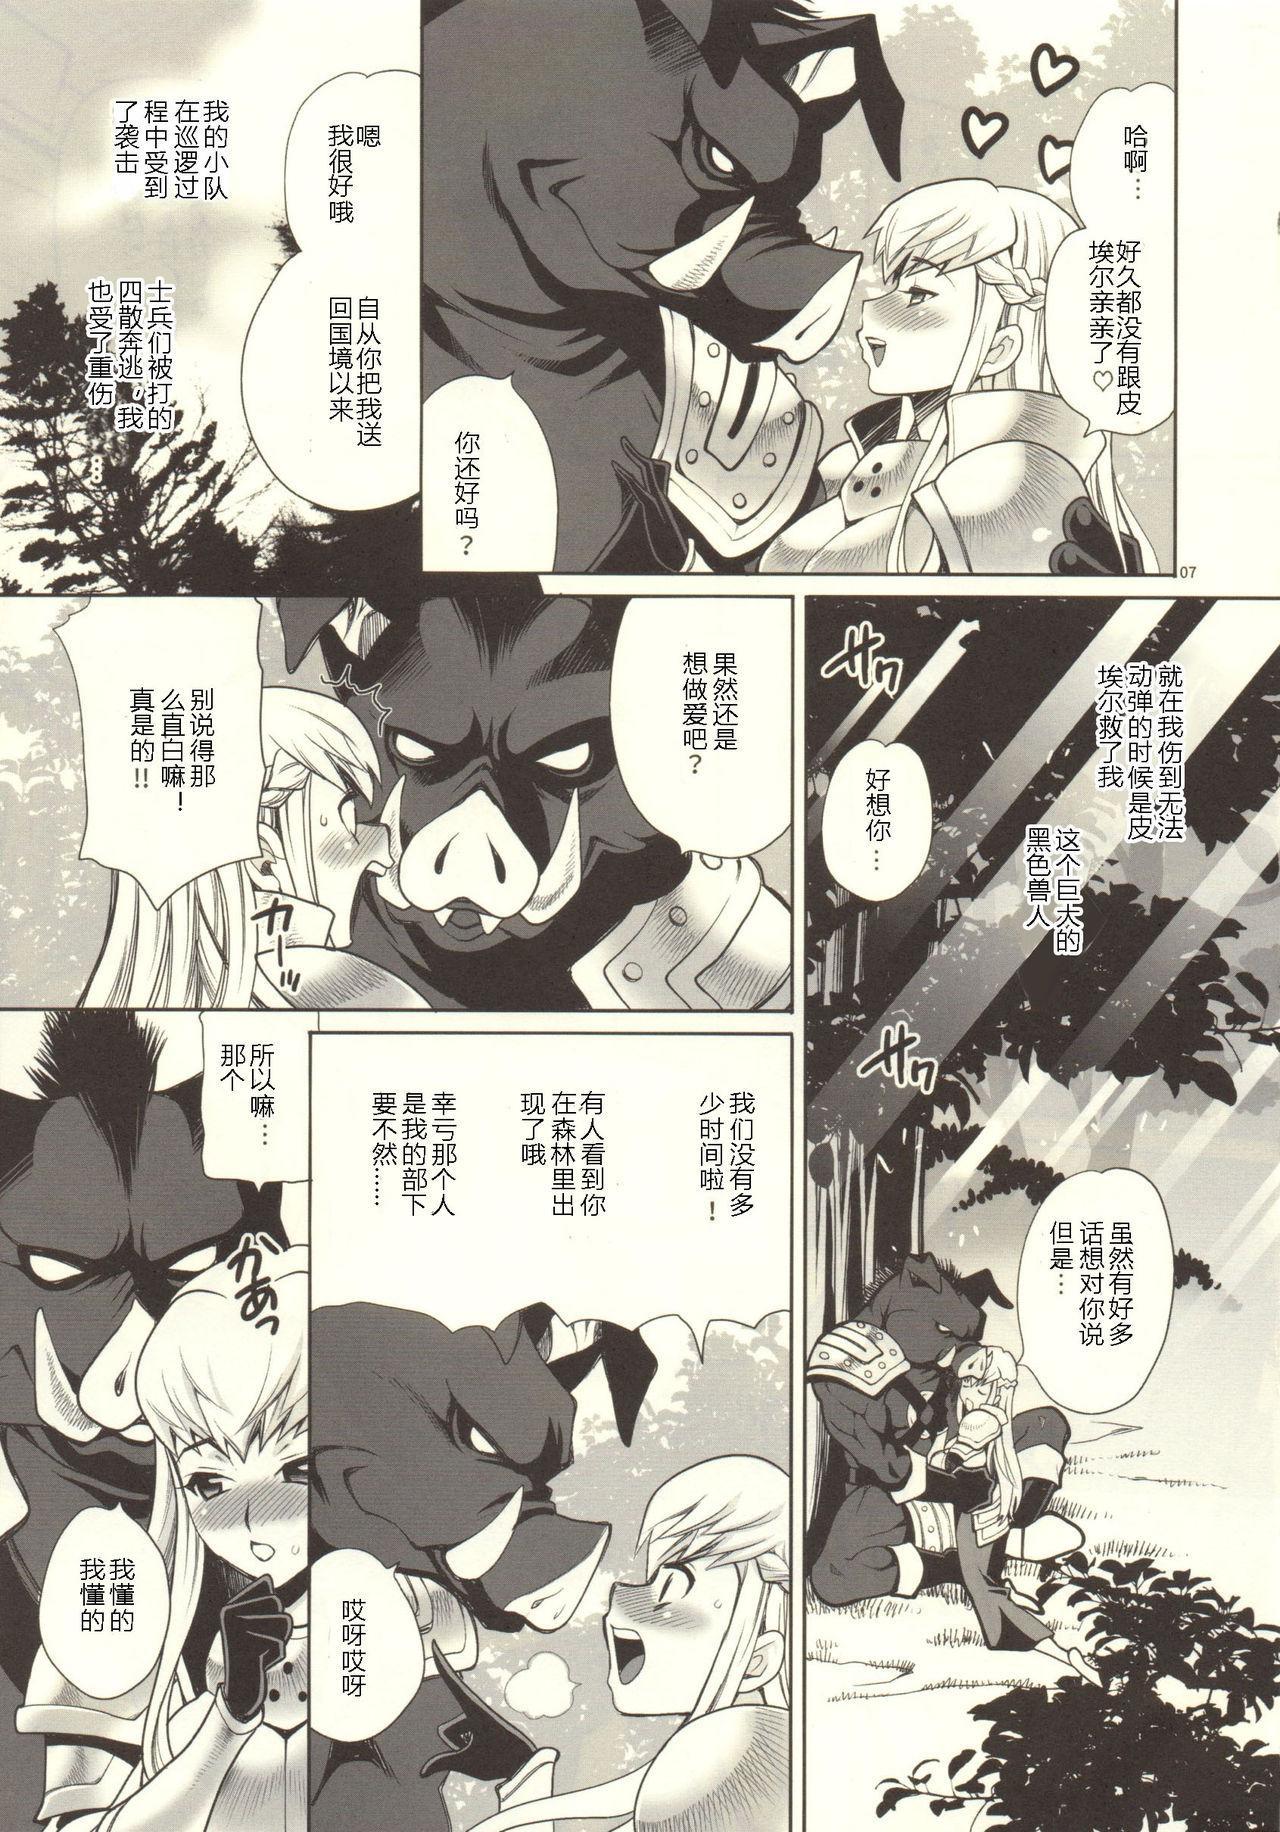 Yukiyanagi no Hon 37 Buta to Onnakishi - Lady knight in love with Orc 5